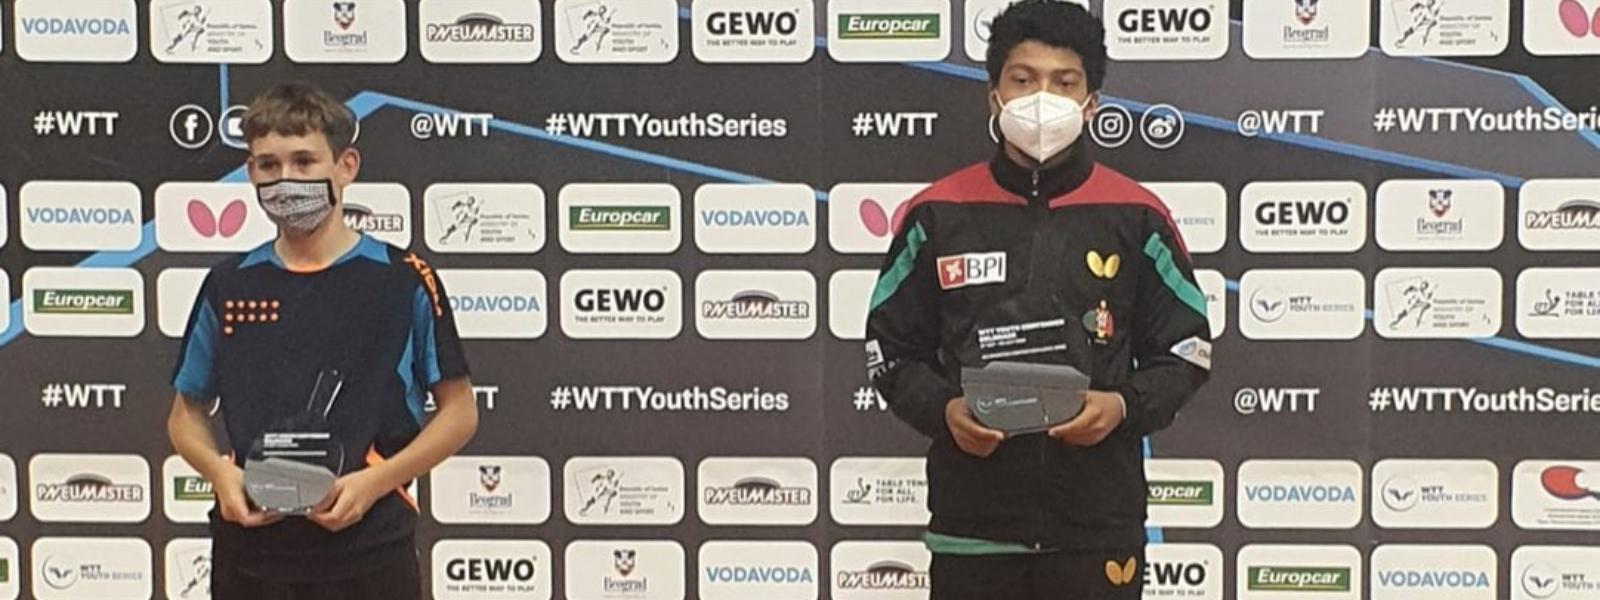 Tiago Abiodun venceu prova sub13 em Belgrado